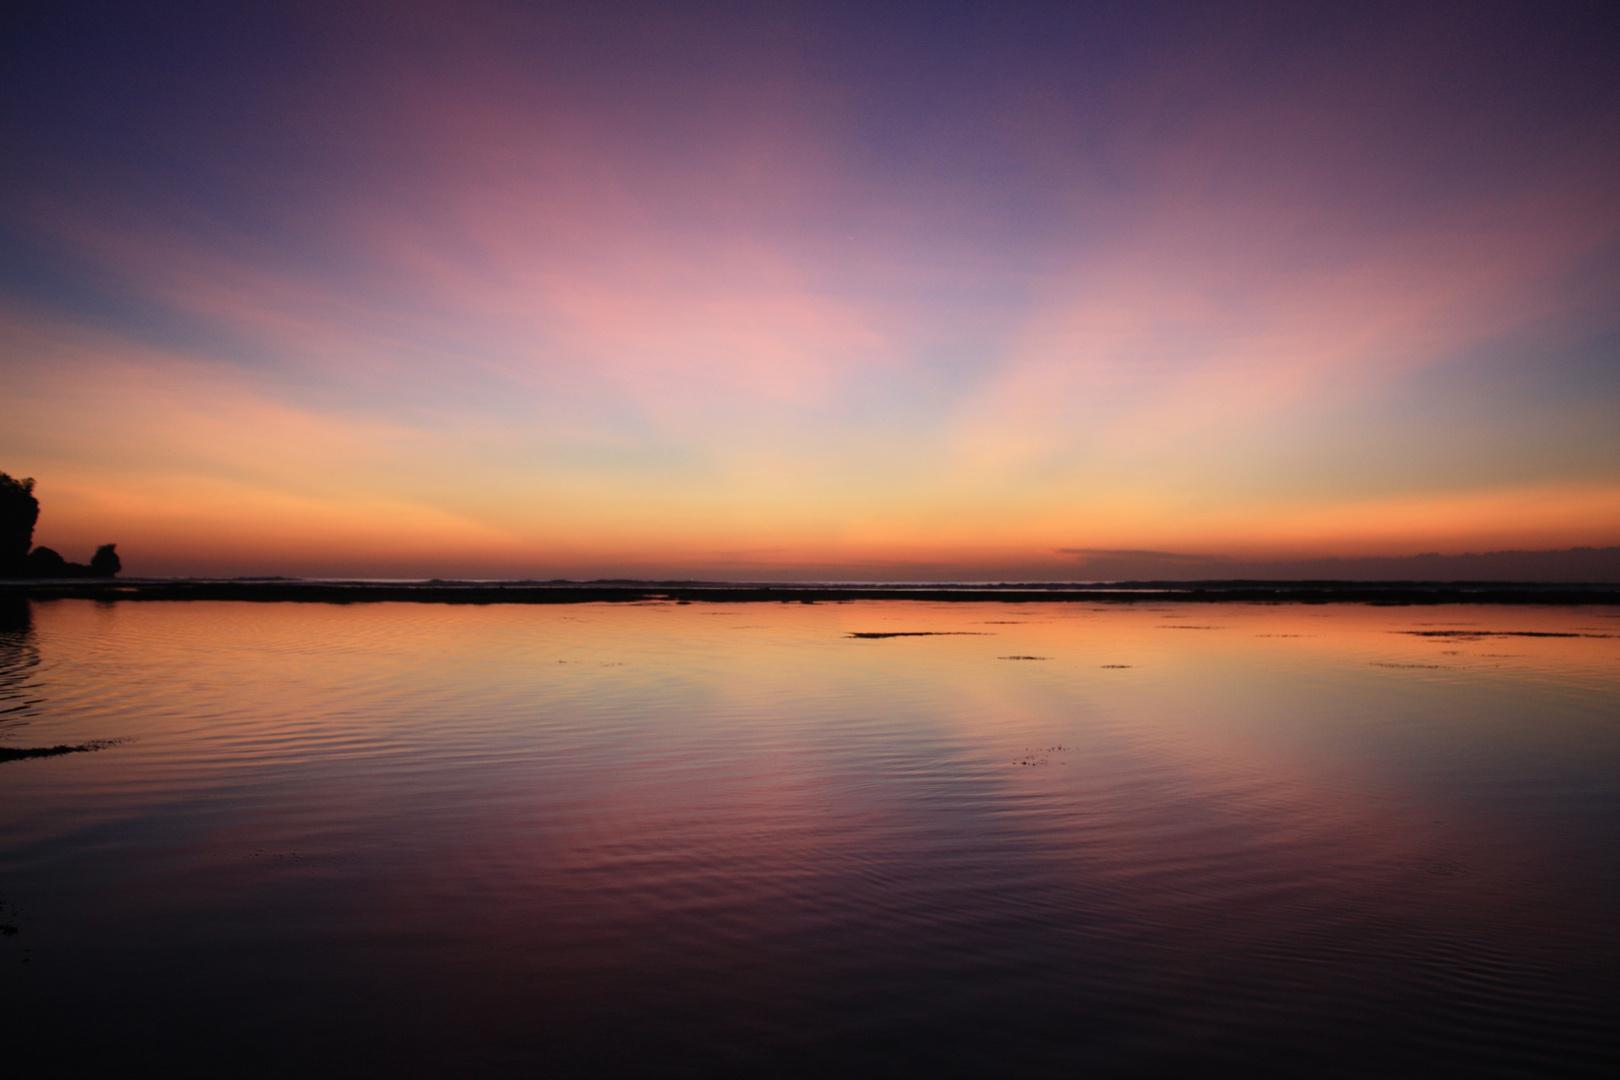 Sunset at Padang Padang Beach, Bali